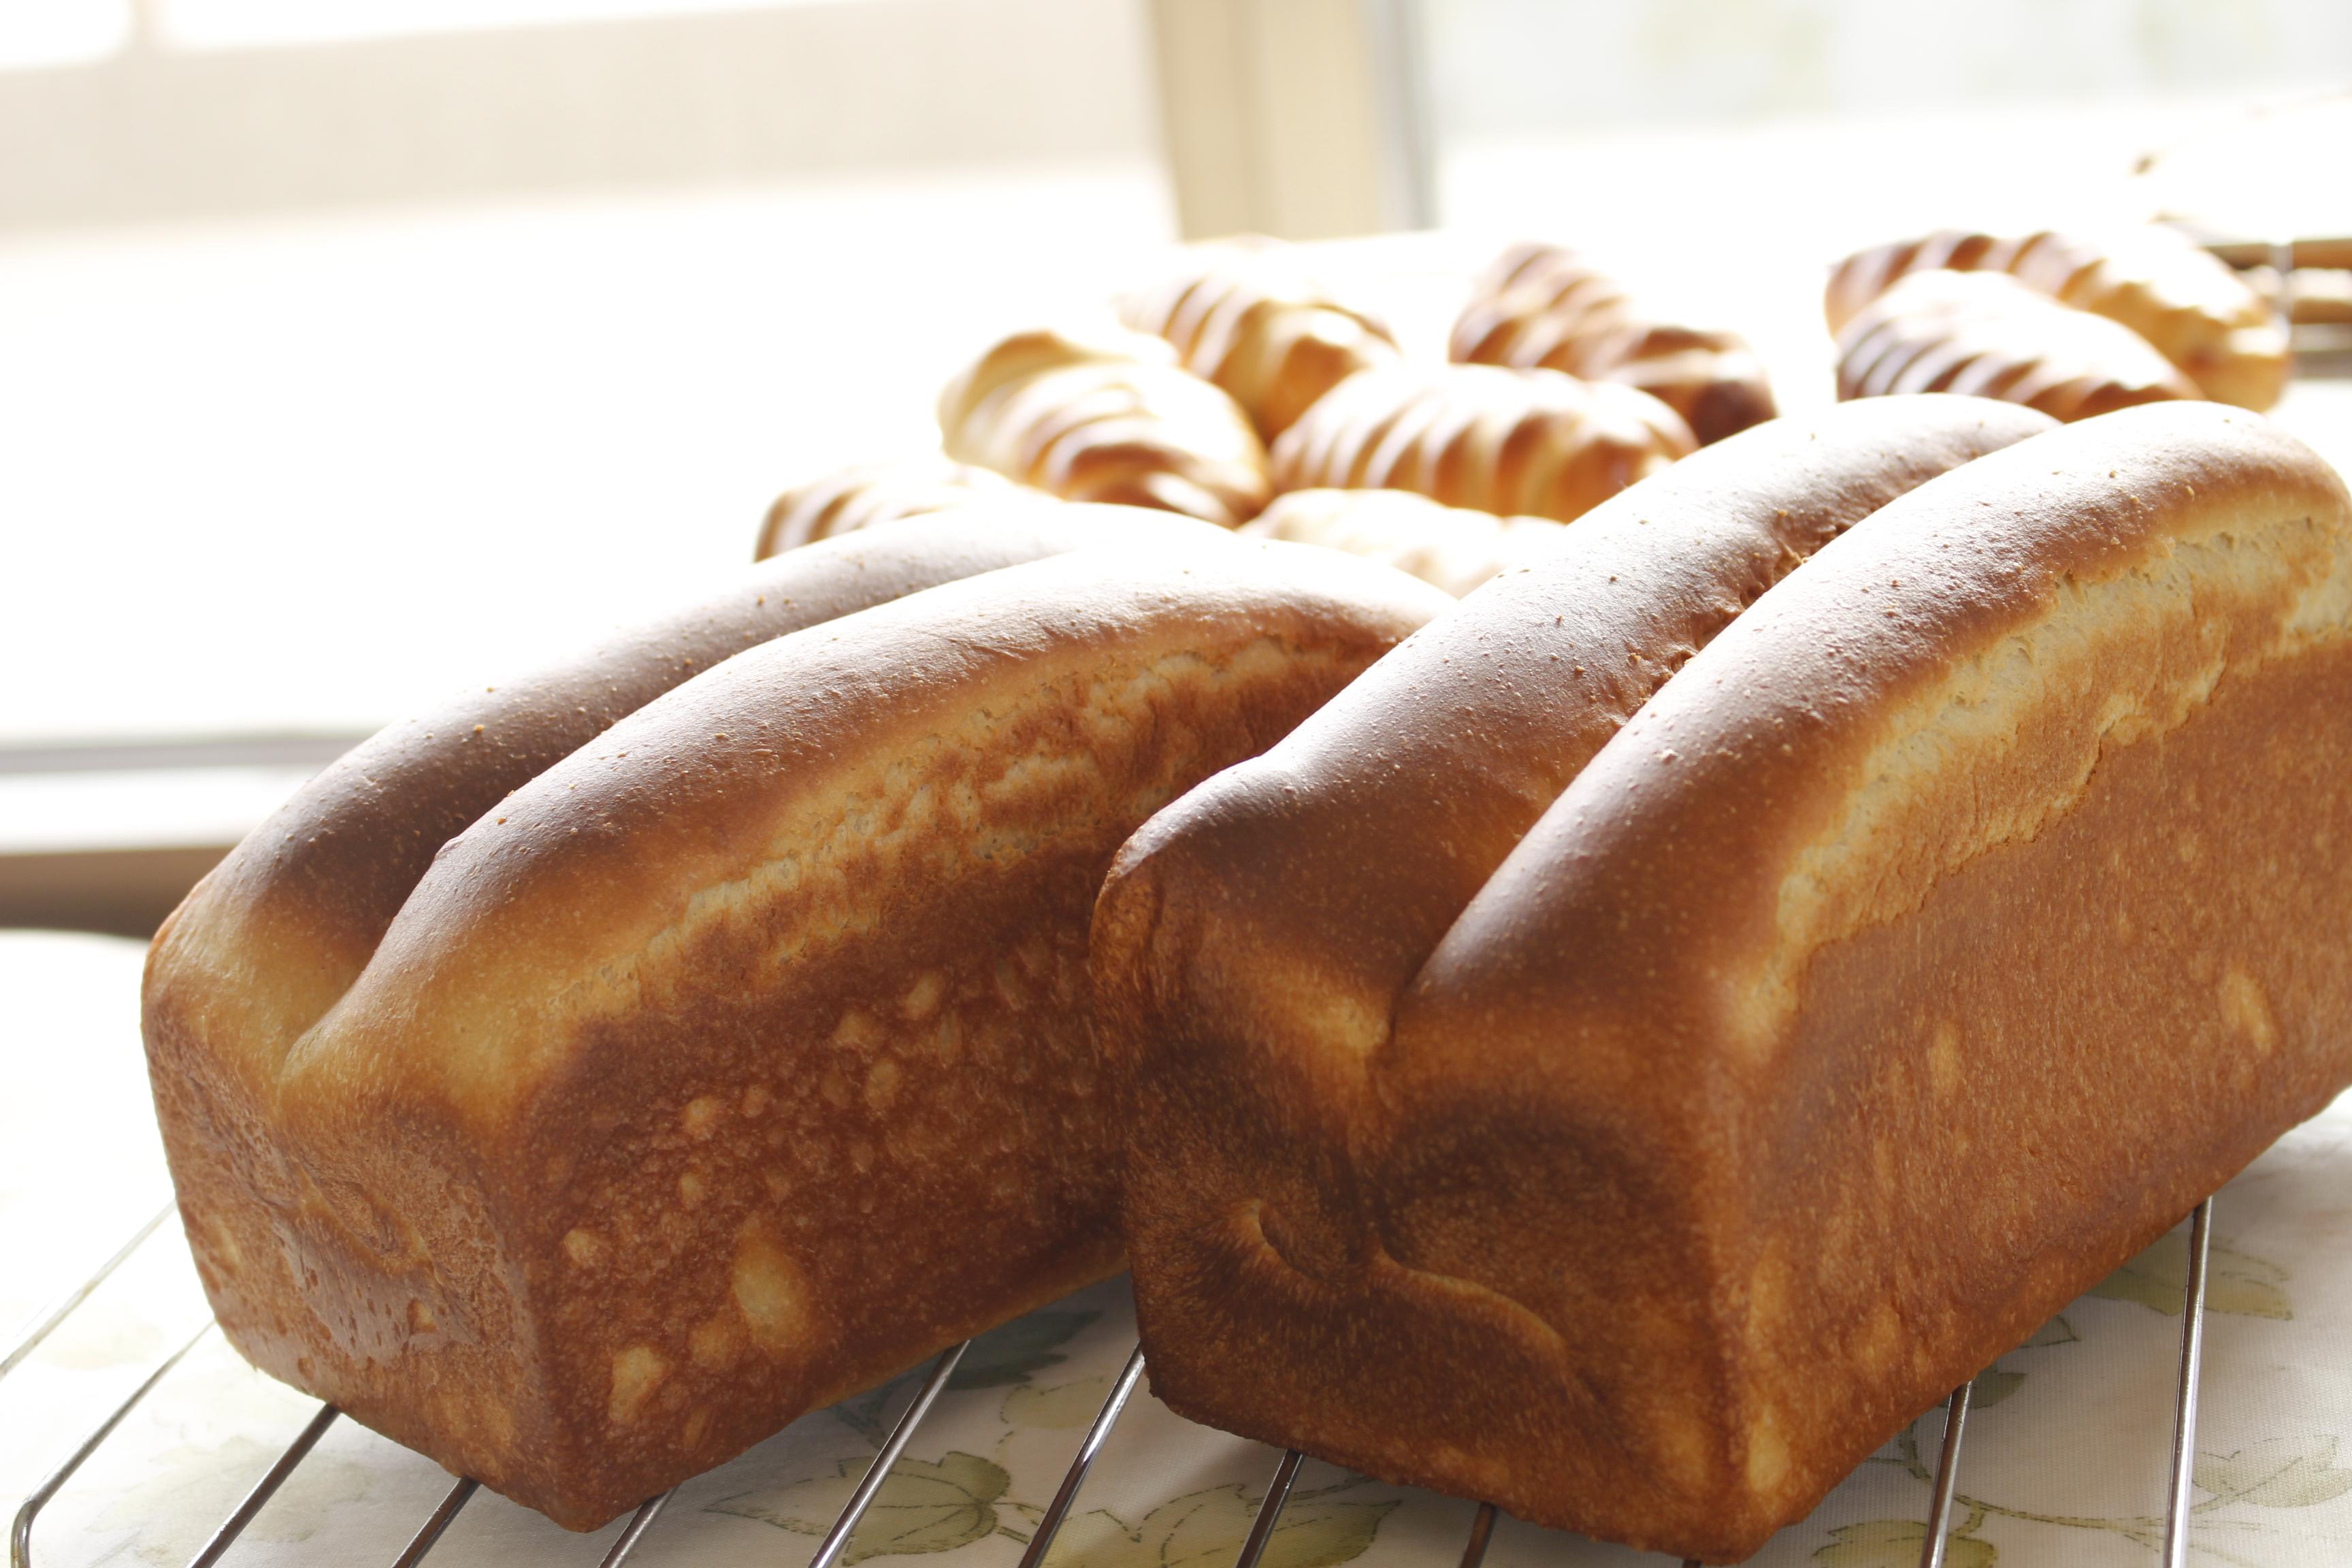 -ta-sante糖質制限パン料理教室。京都江部粉糖質制限パンアドバンスコース3回目『変わり山食&ランチブレッド